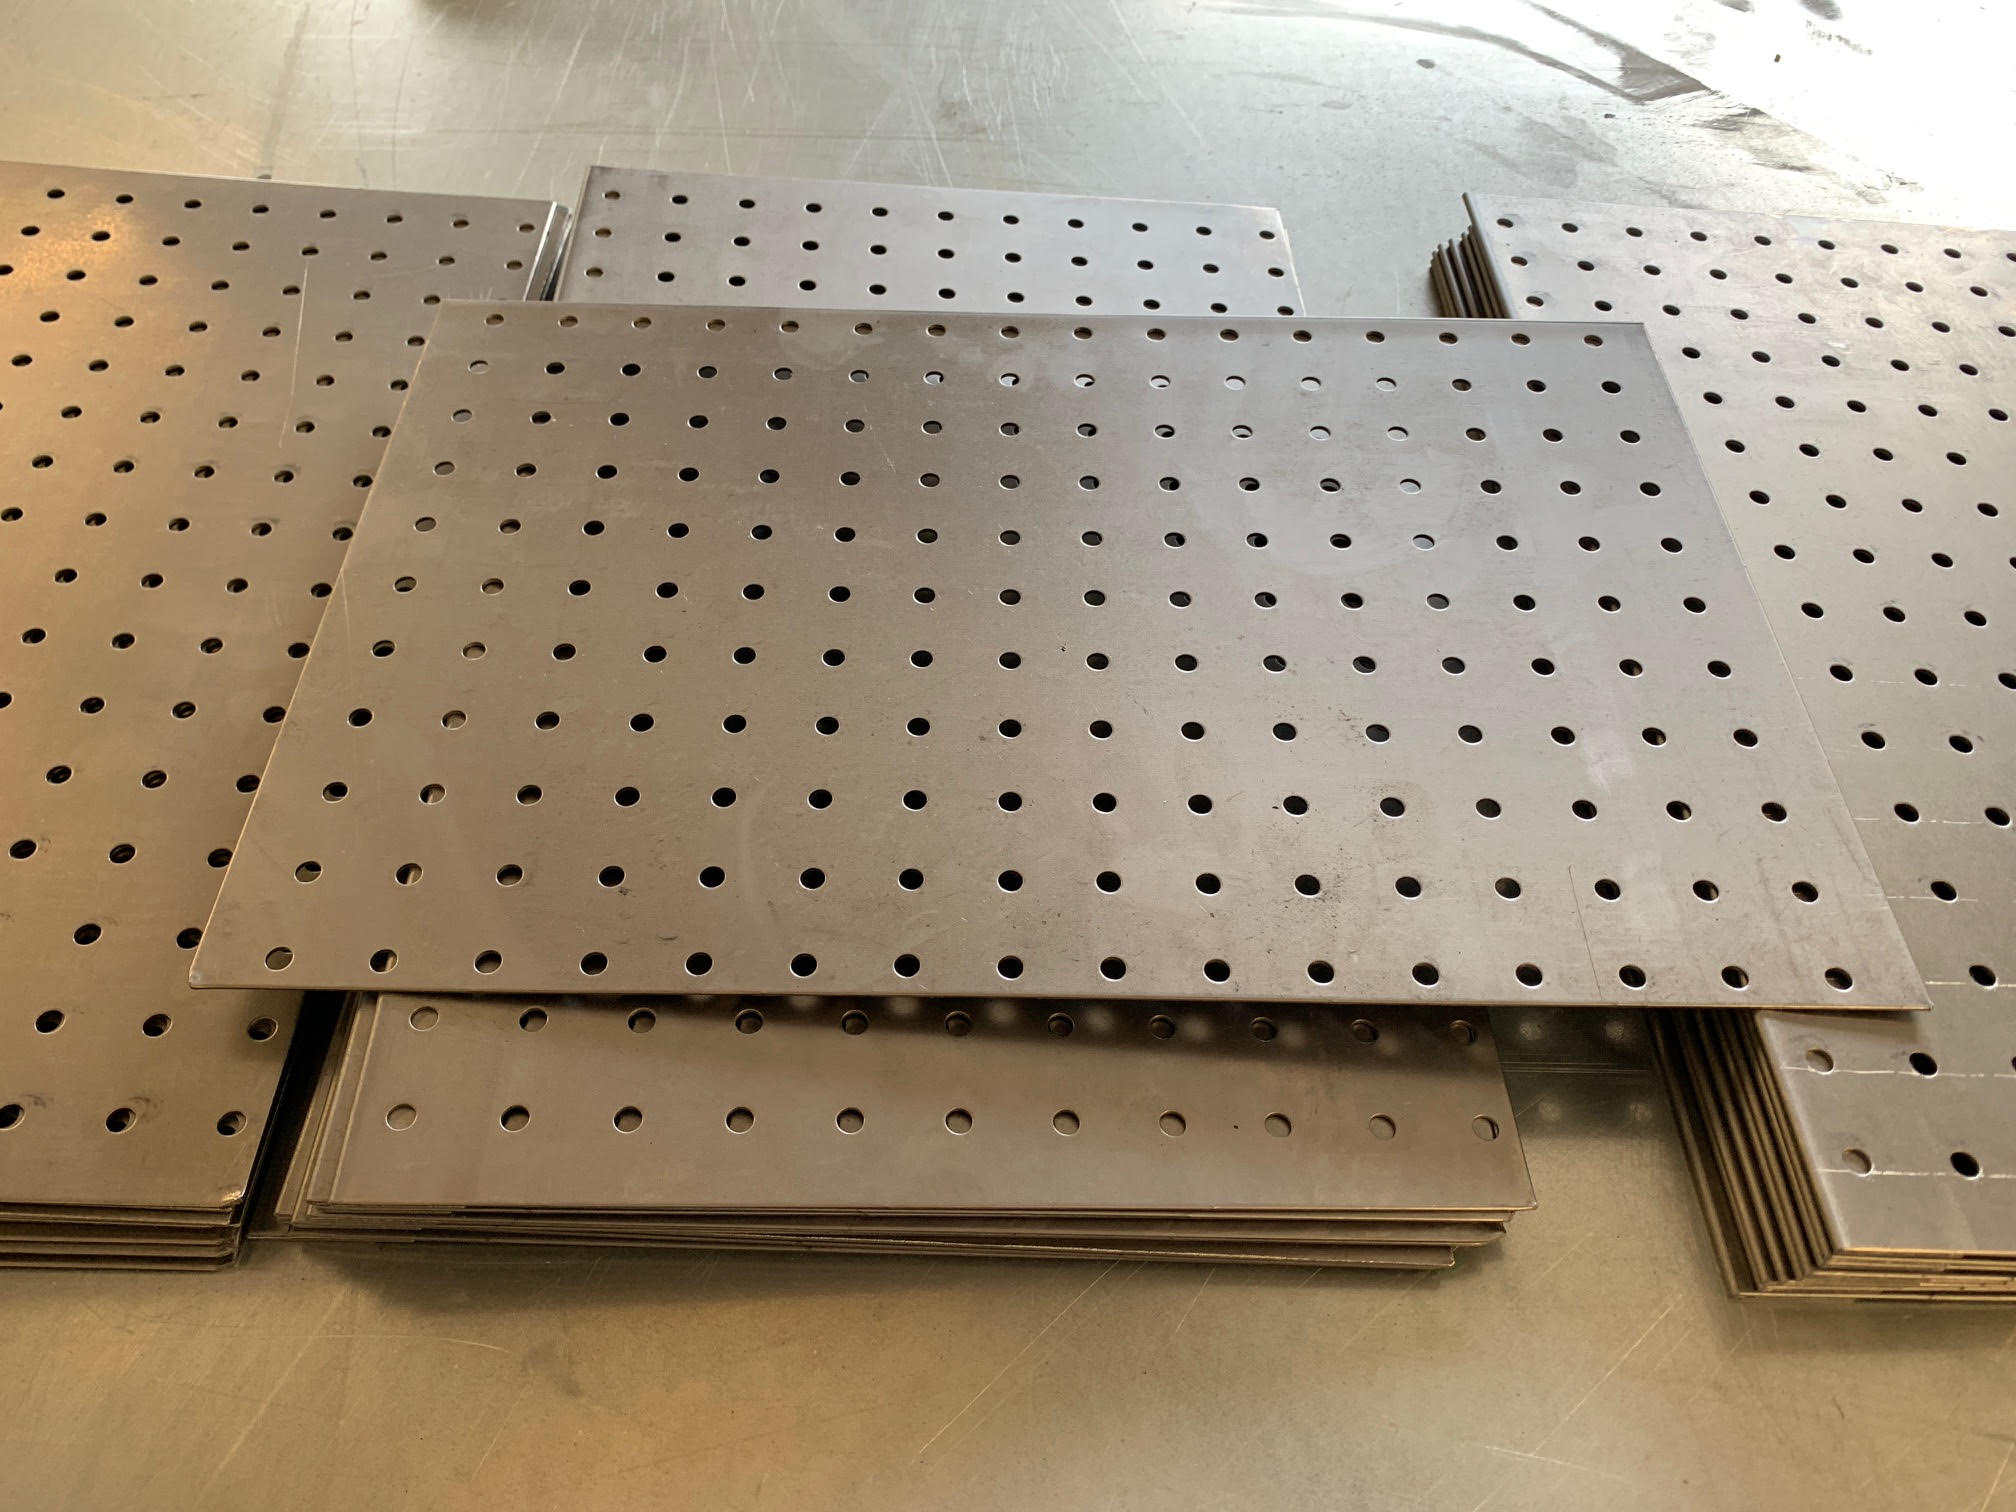 16 ga steel Perforated Shelves